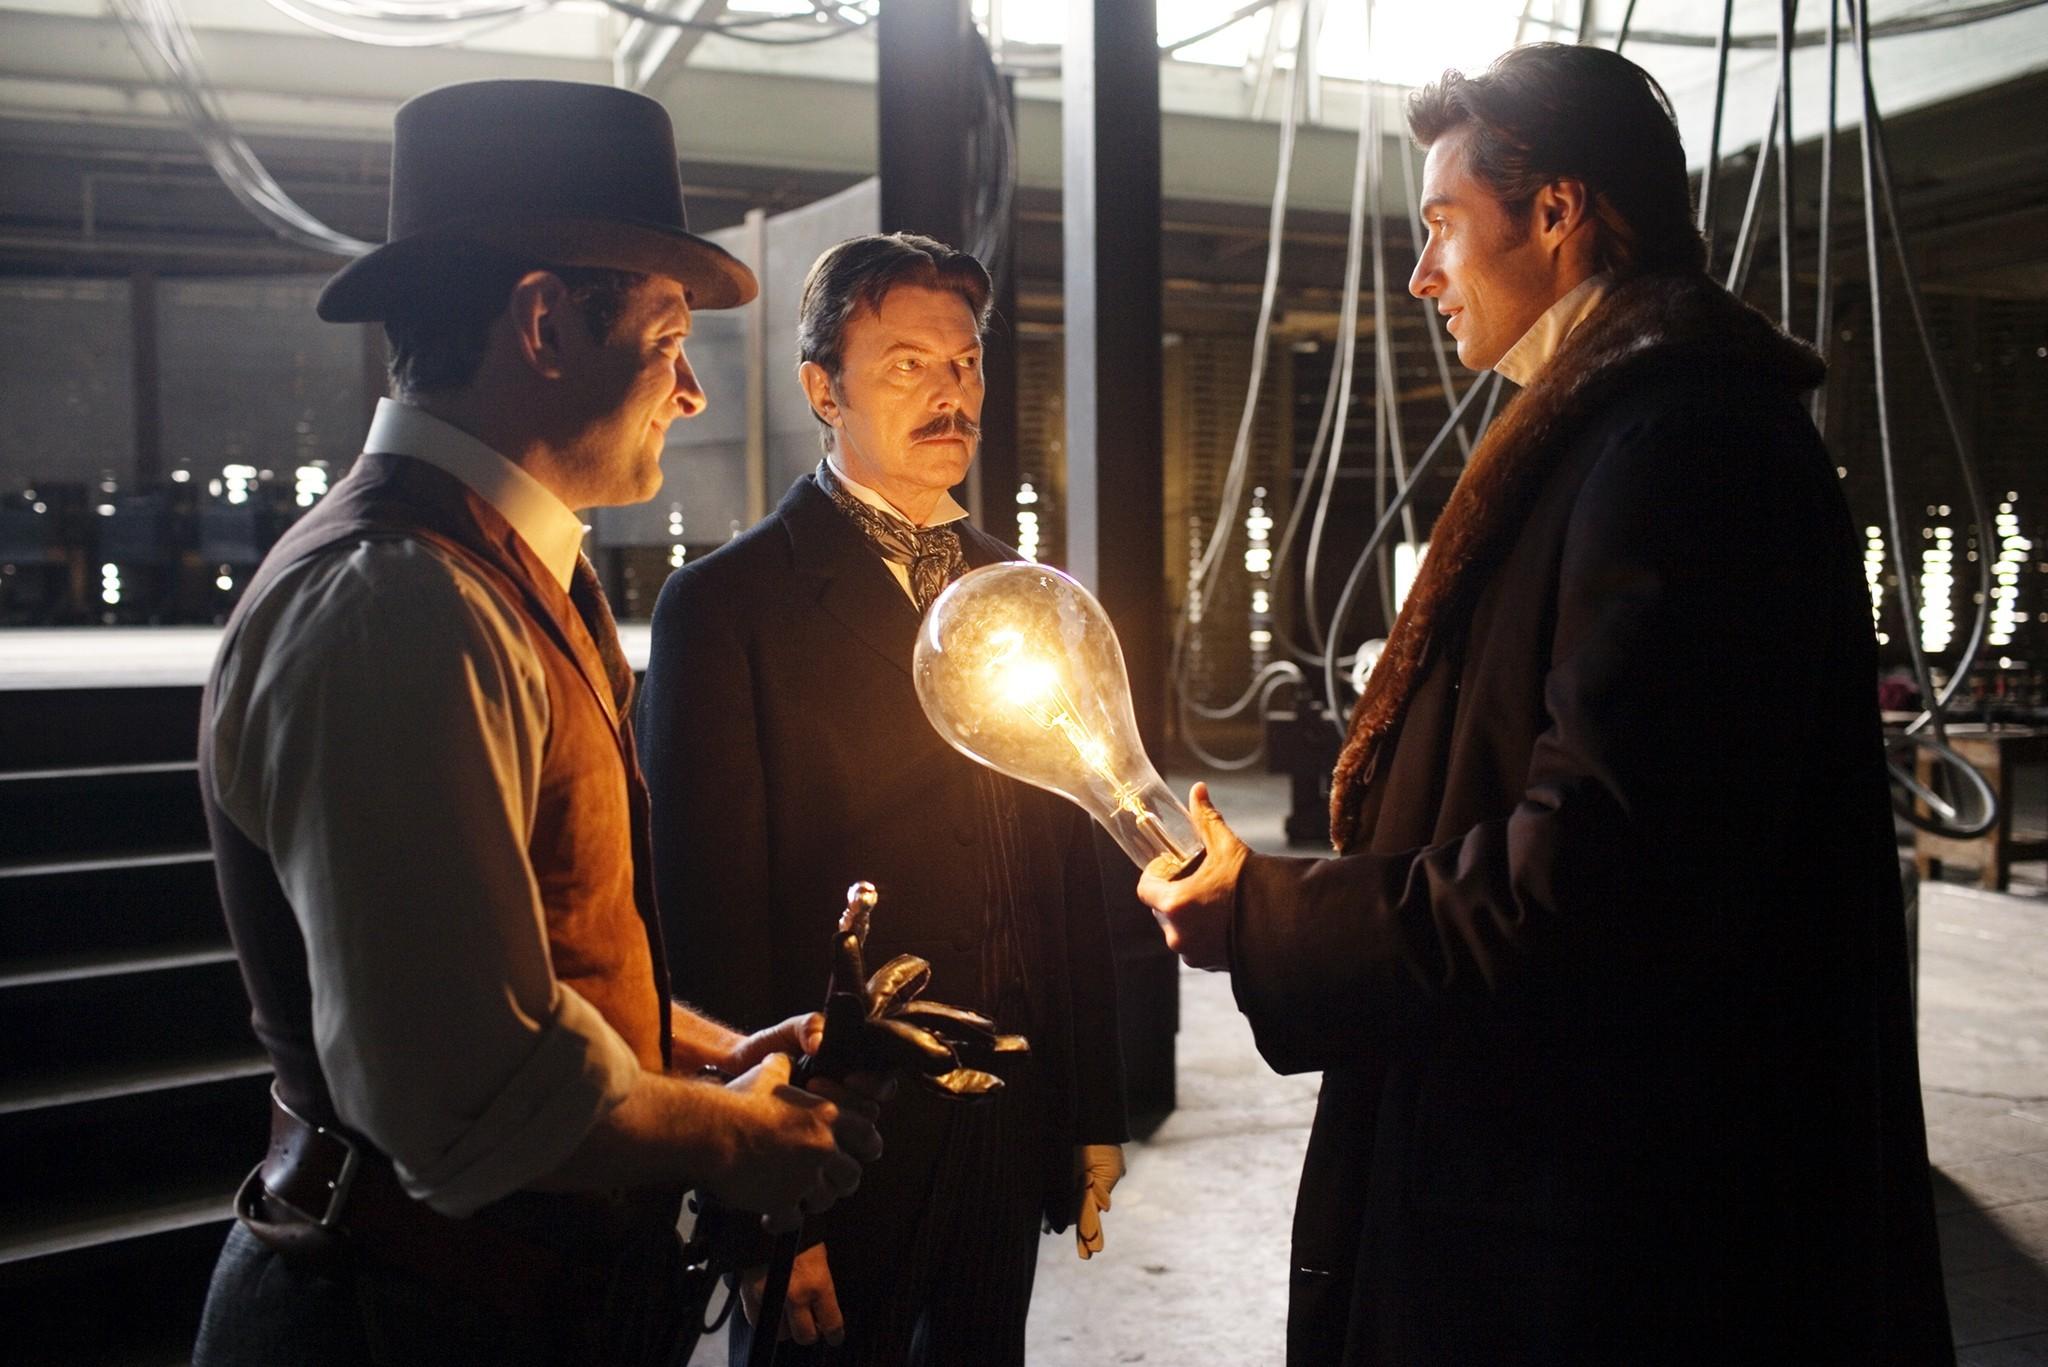 Movies magic Nikola Tesla actors scientists Hugh Jackman The Prestige Andy  Serkis wallpaper | | 59840 | WallpaperUP